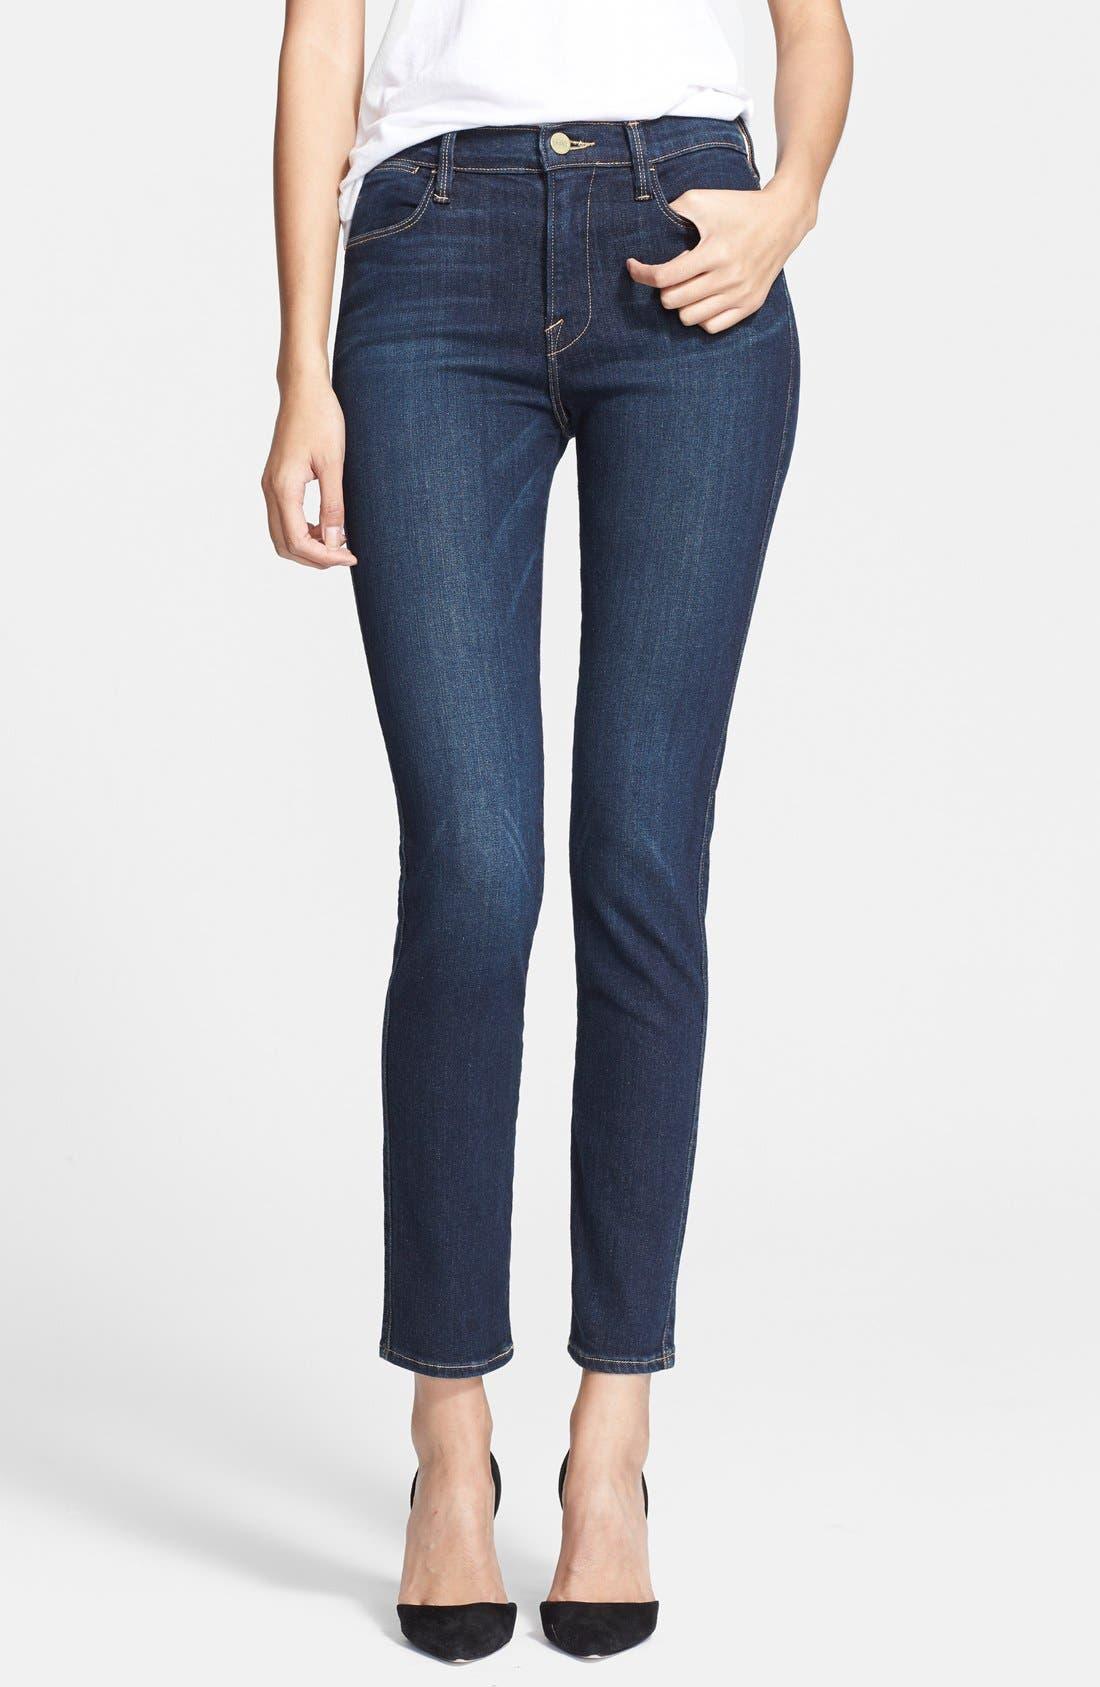 Main Image - Frame Denim 'Le High Skinny' Jeans (Altair)